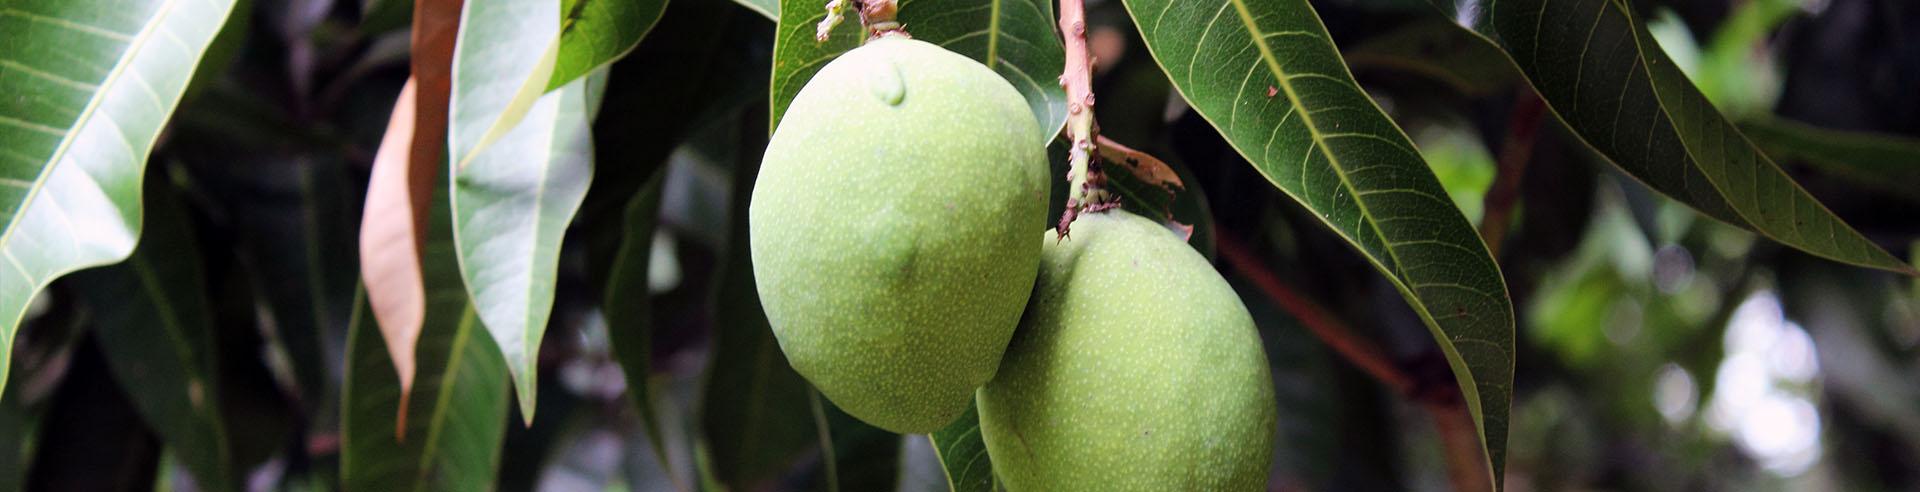 Grüne Frucht aus Paraguay